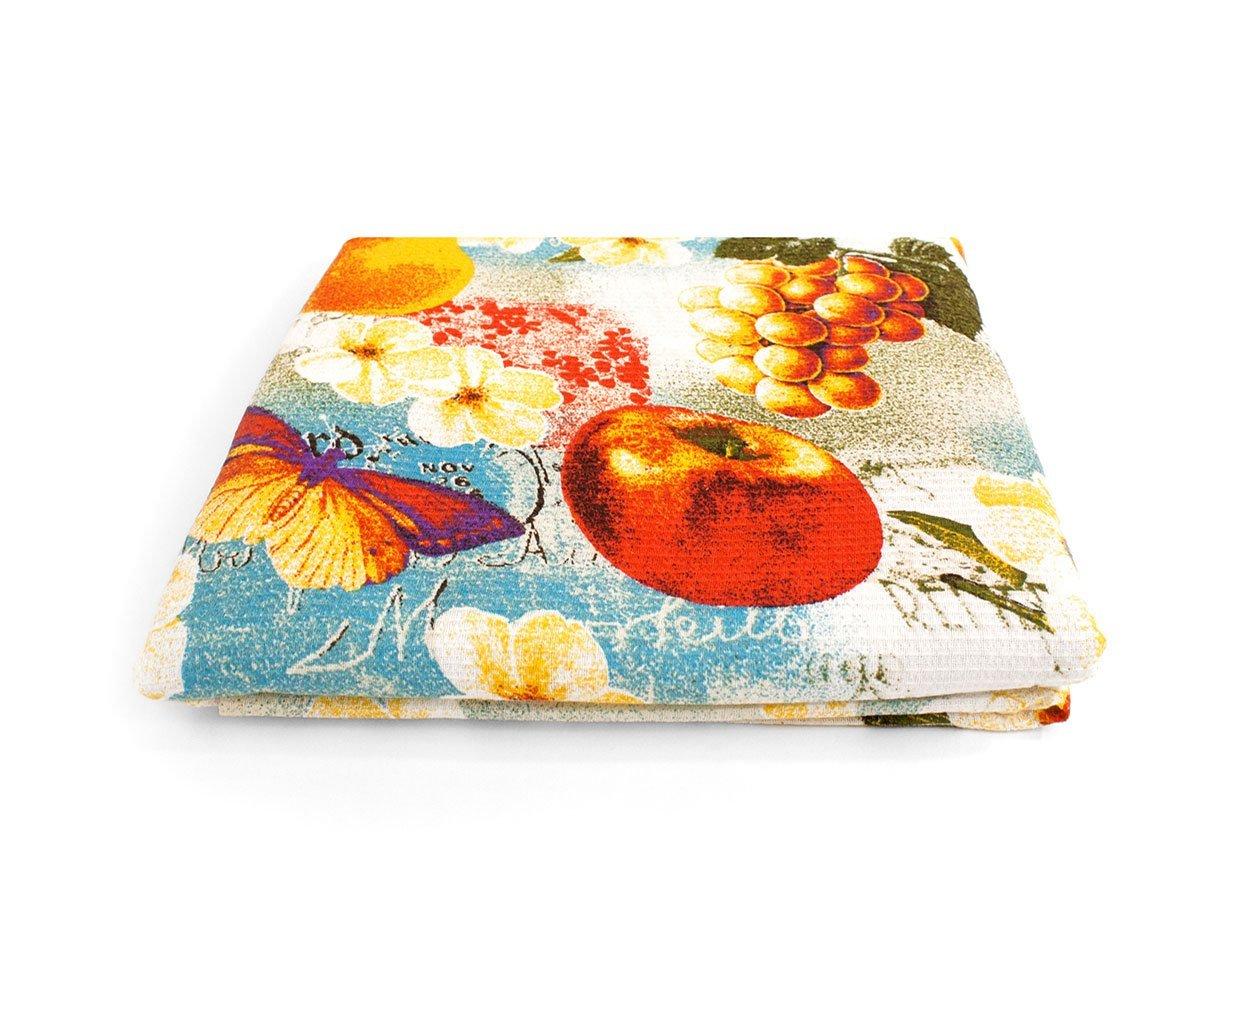 Фруктовый сад - вафельные полотенца, простыни для сауны Elin